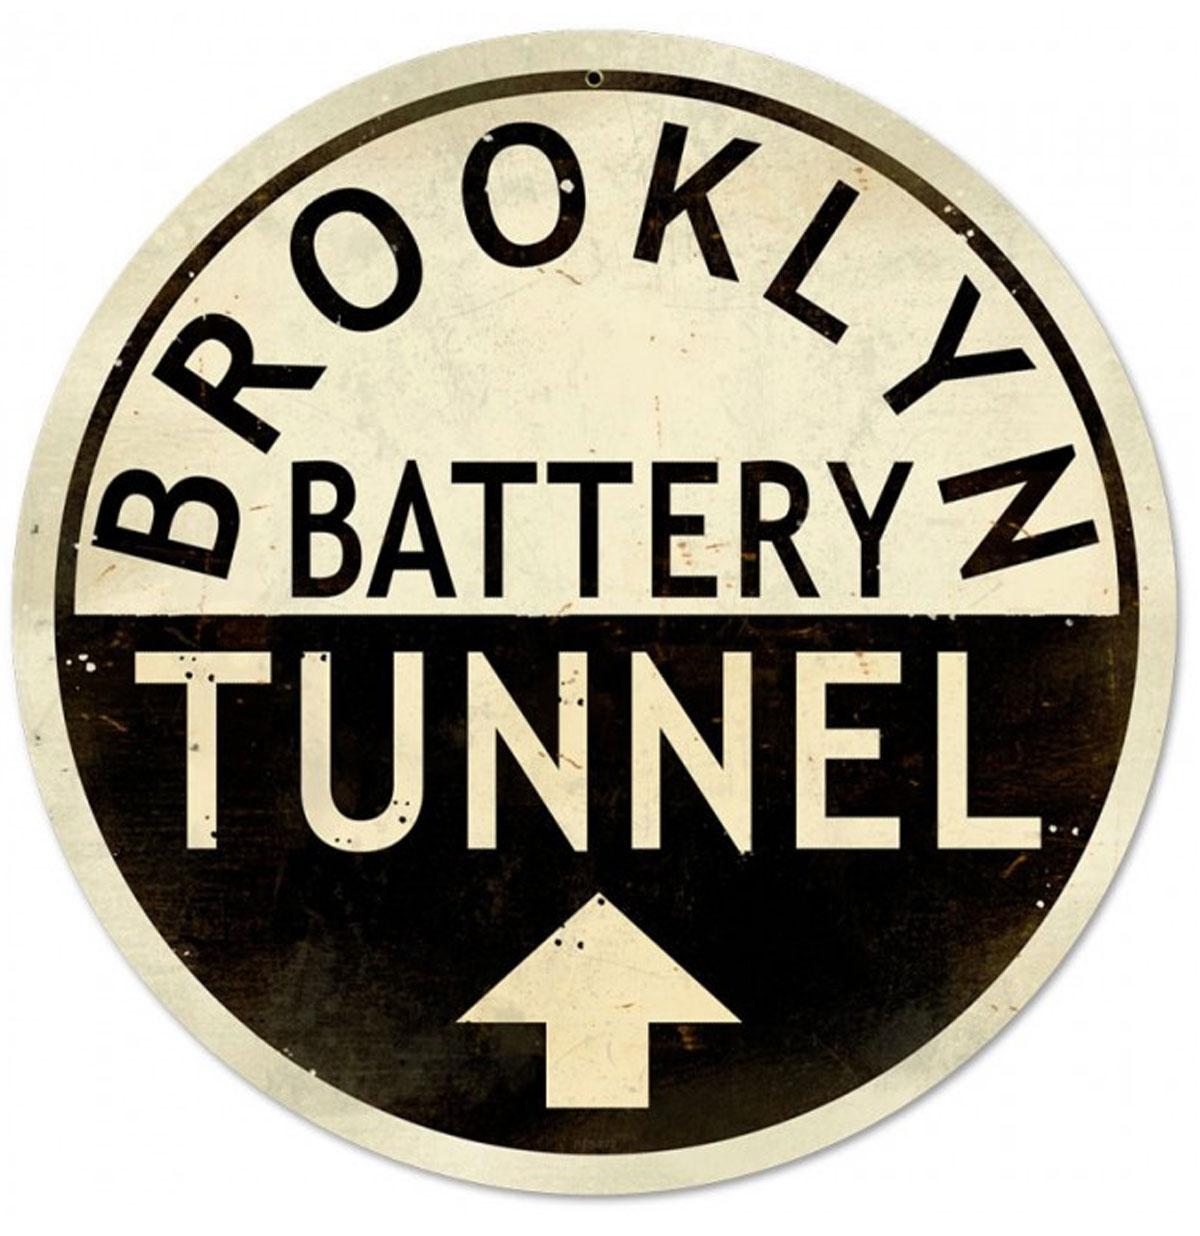 New York Brooklyn Battery Tunnel Rond Zwaar Metalen Bord 35 cm �